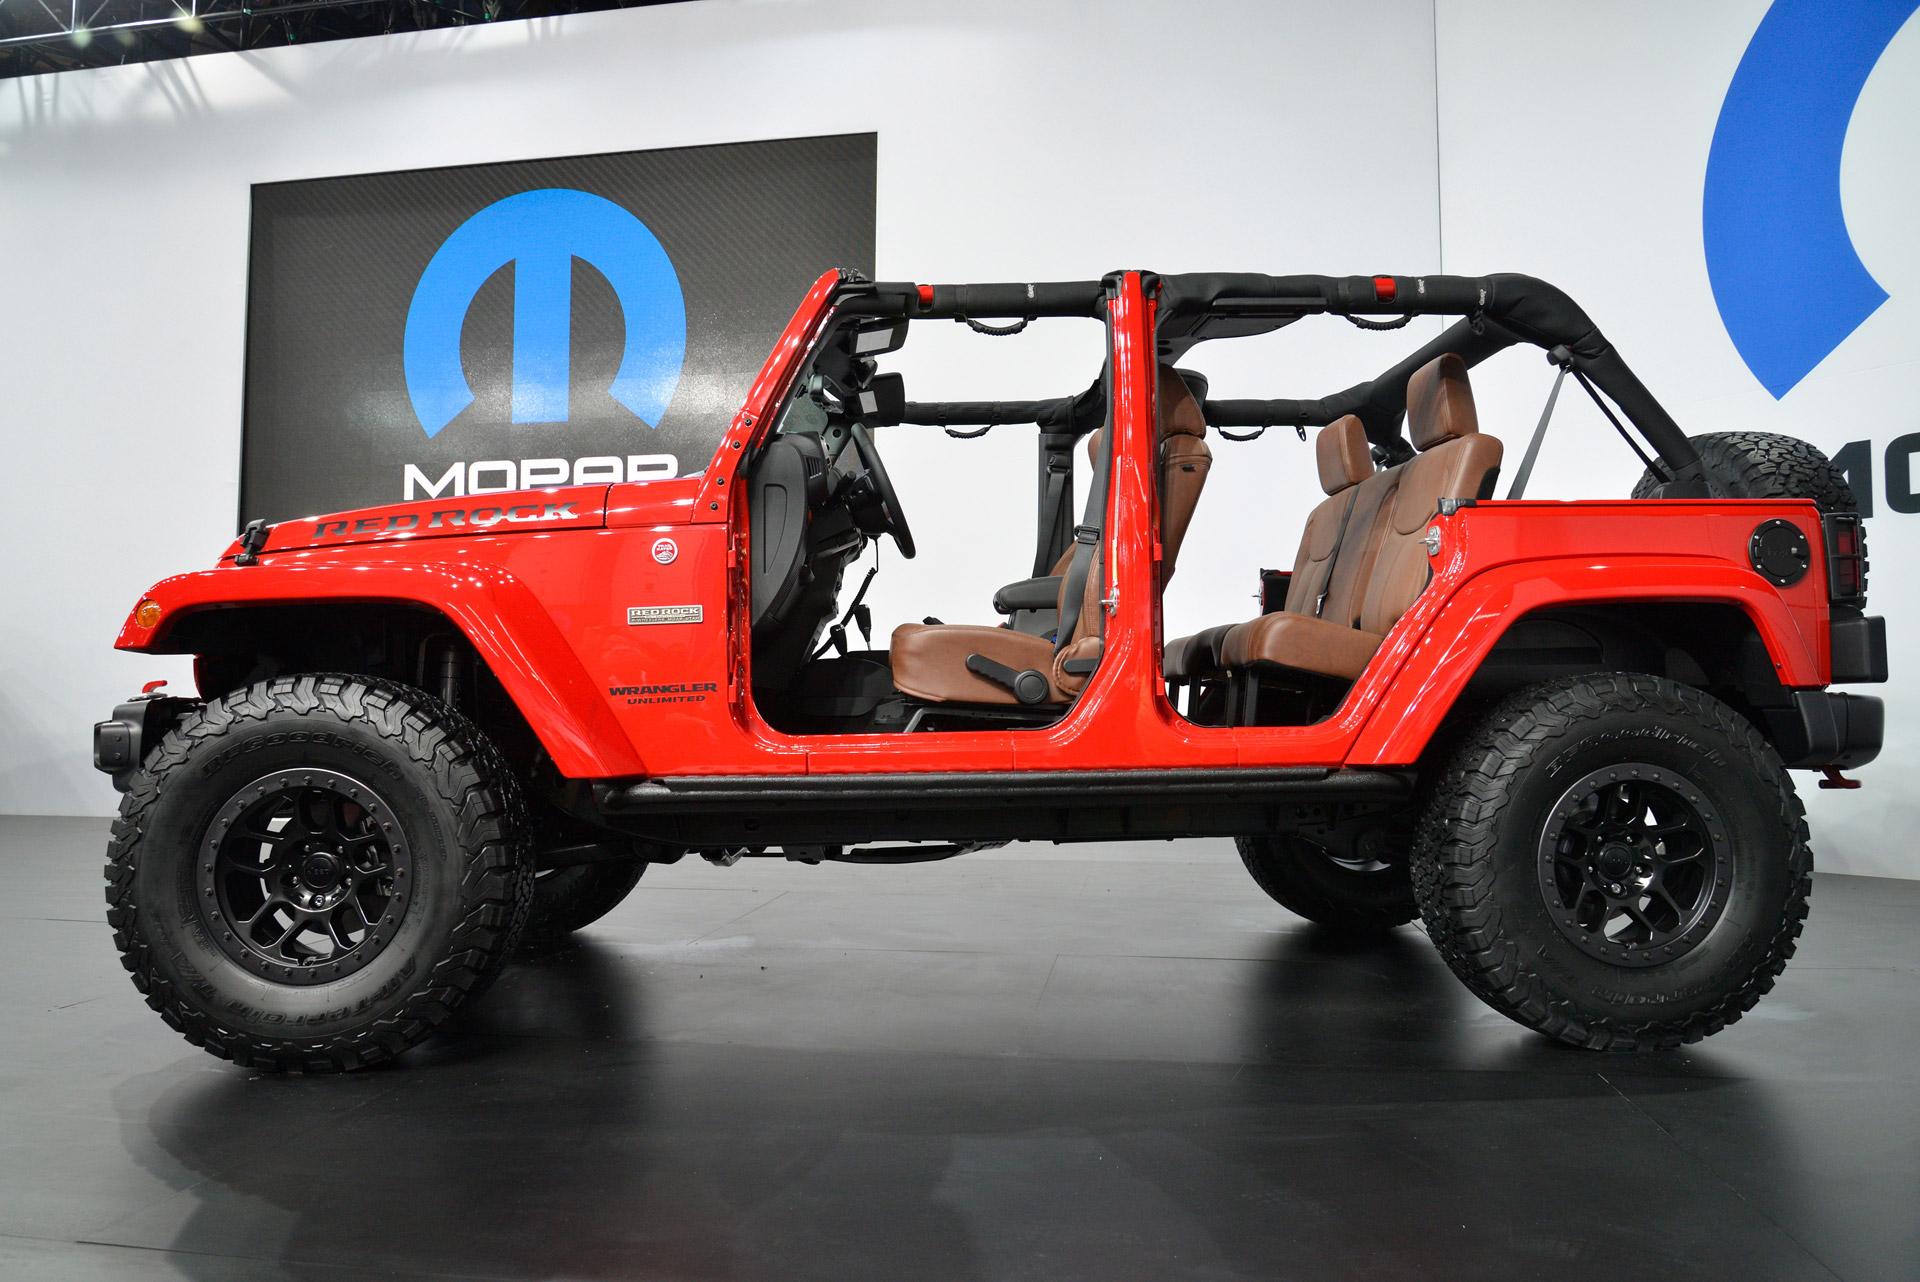 2017 jeep wrangler concept design 2017 - 2017 Jeep Wrangler Concept Design 2017 32